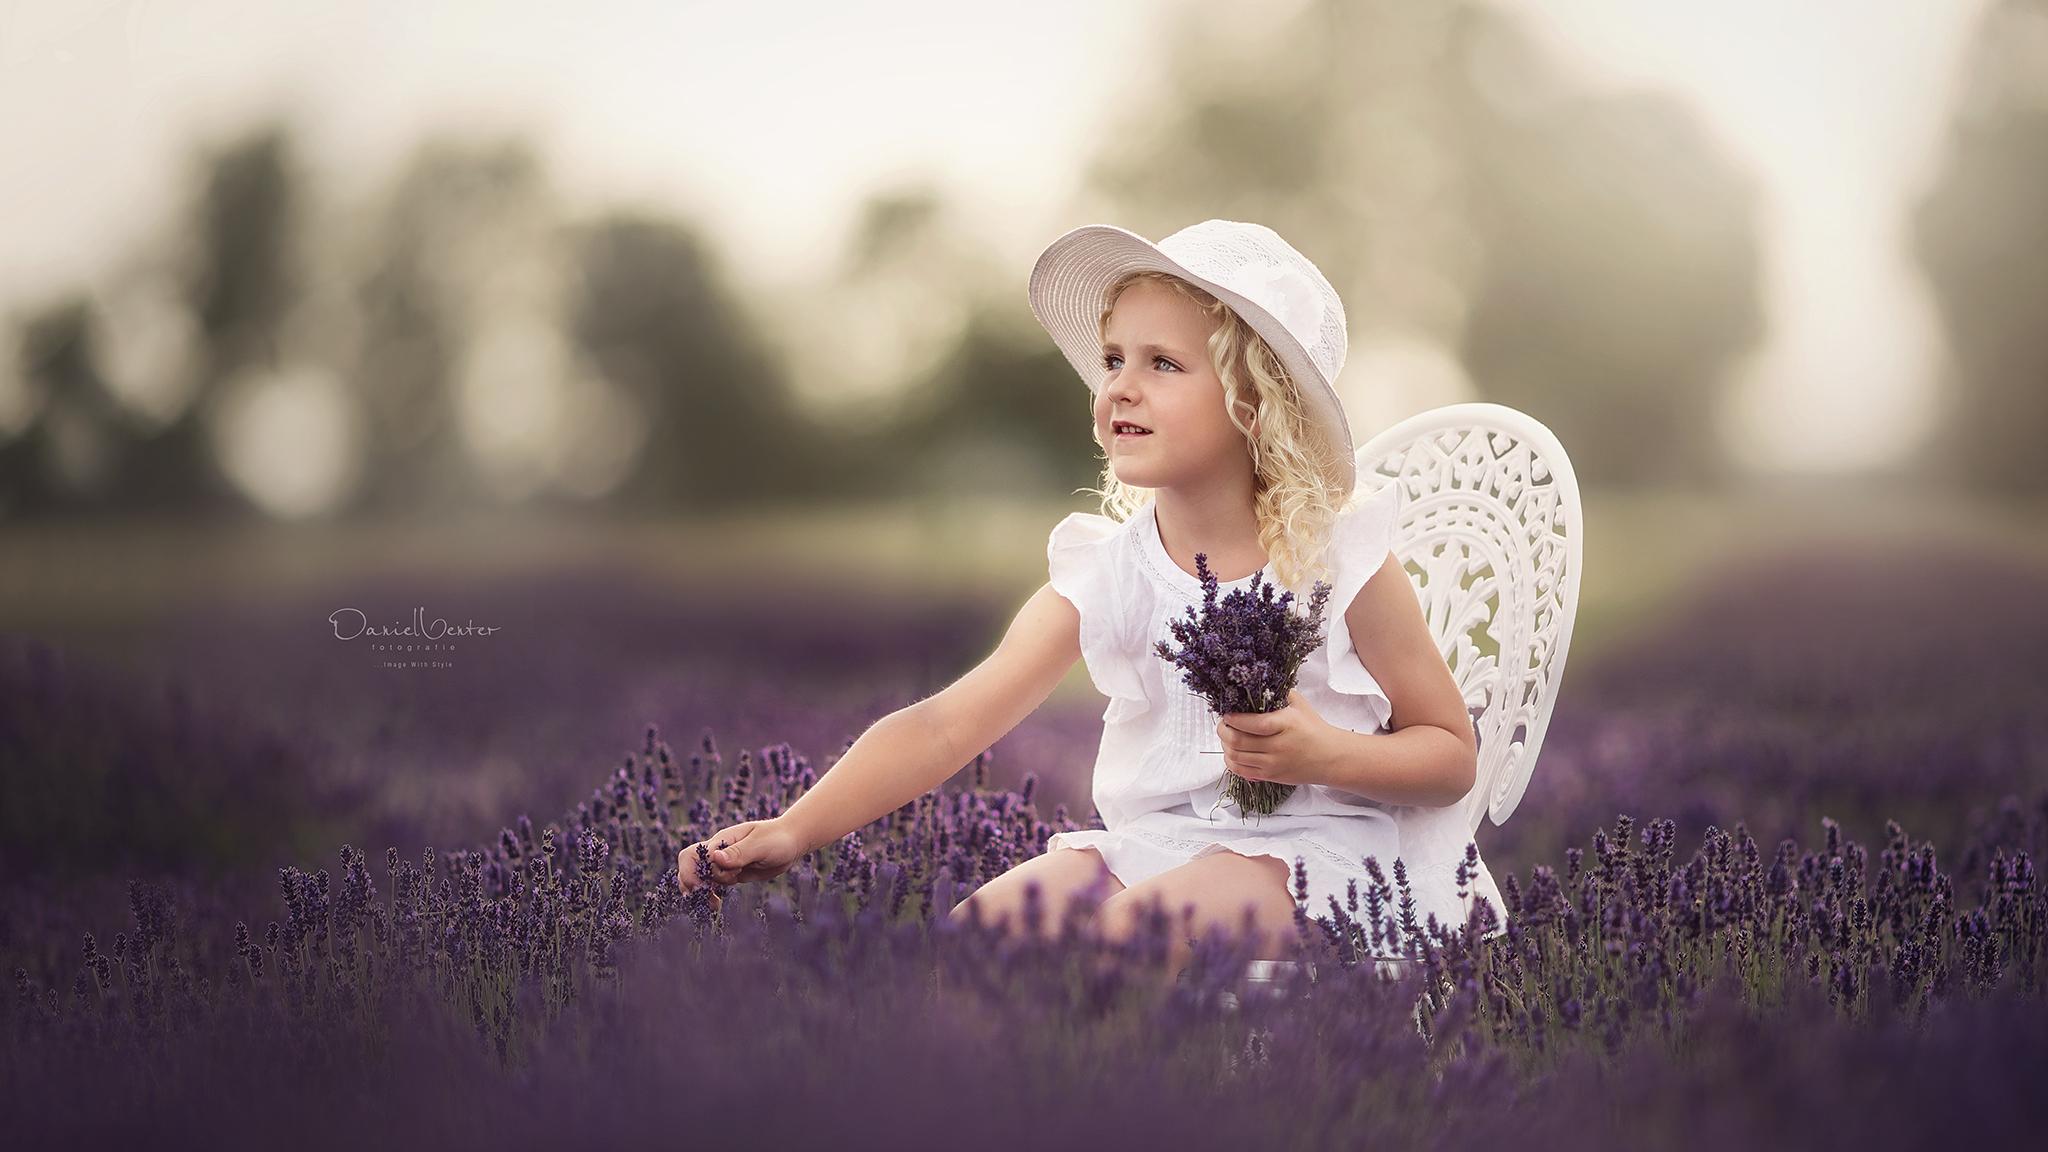 stock-photo-picking-lavender-218224665.jpg